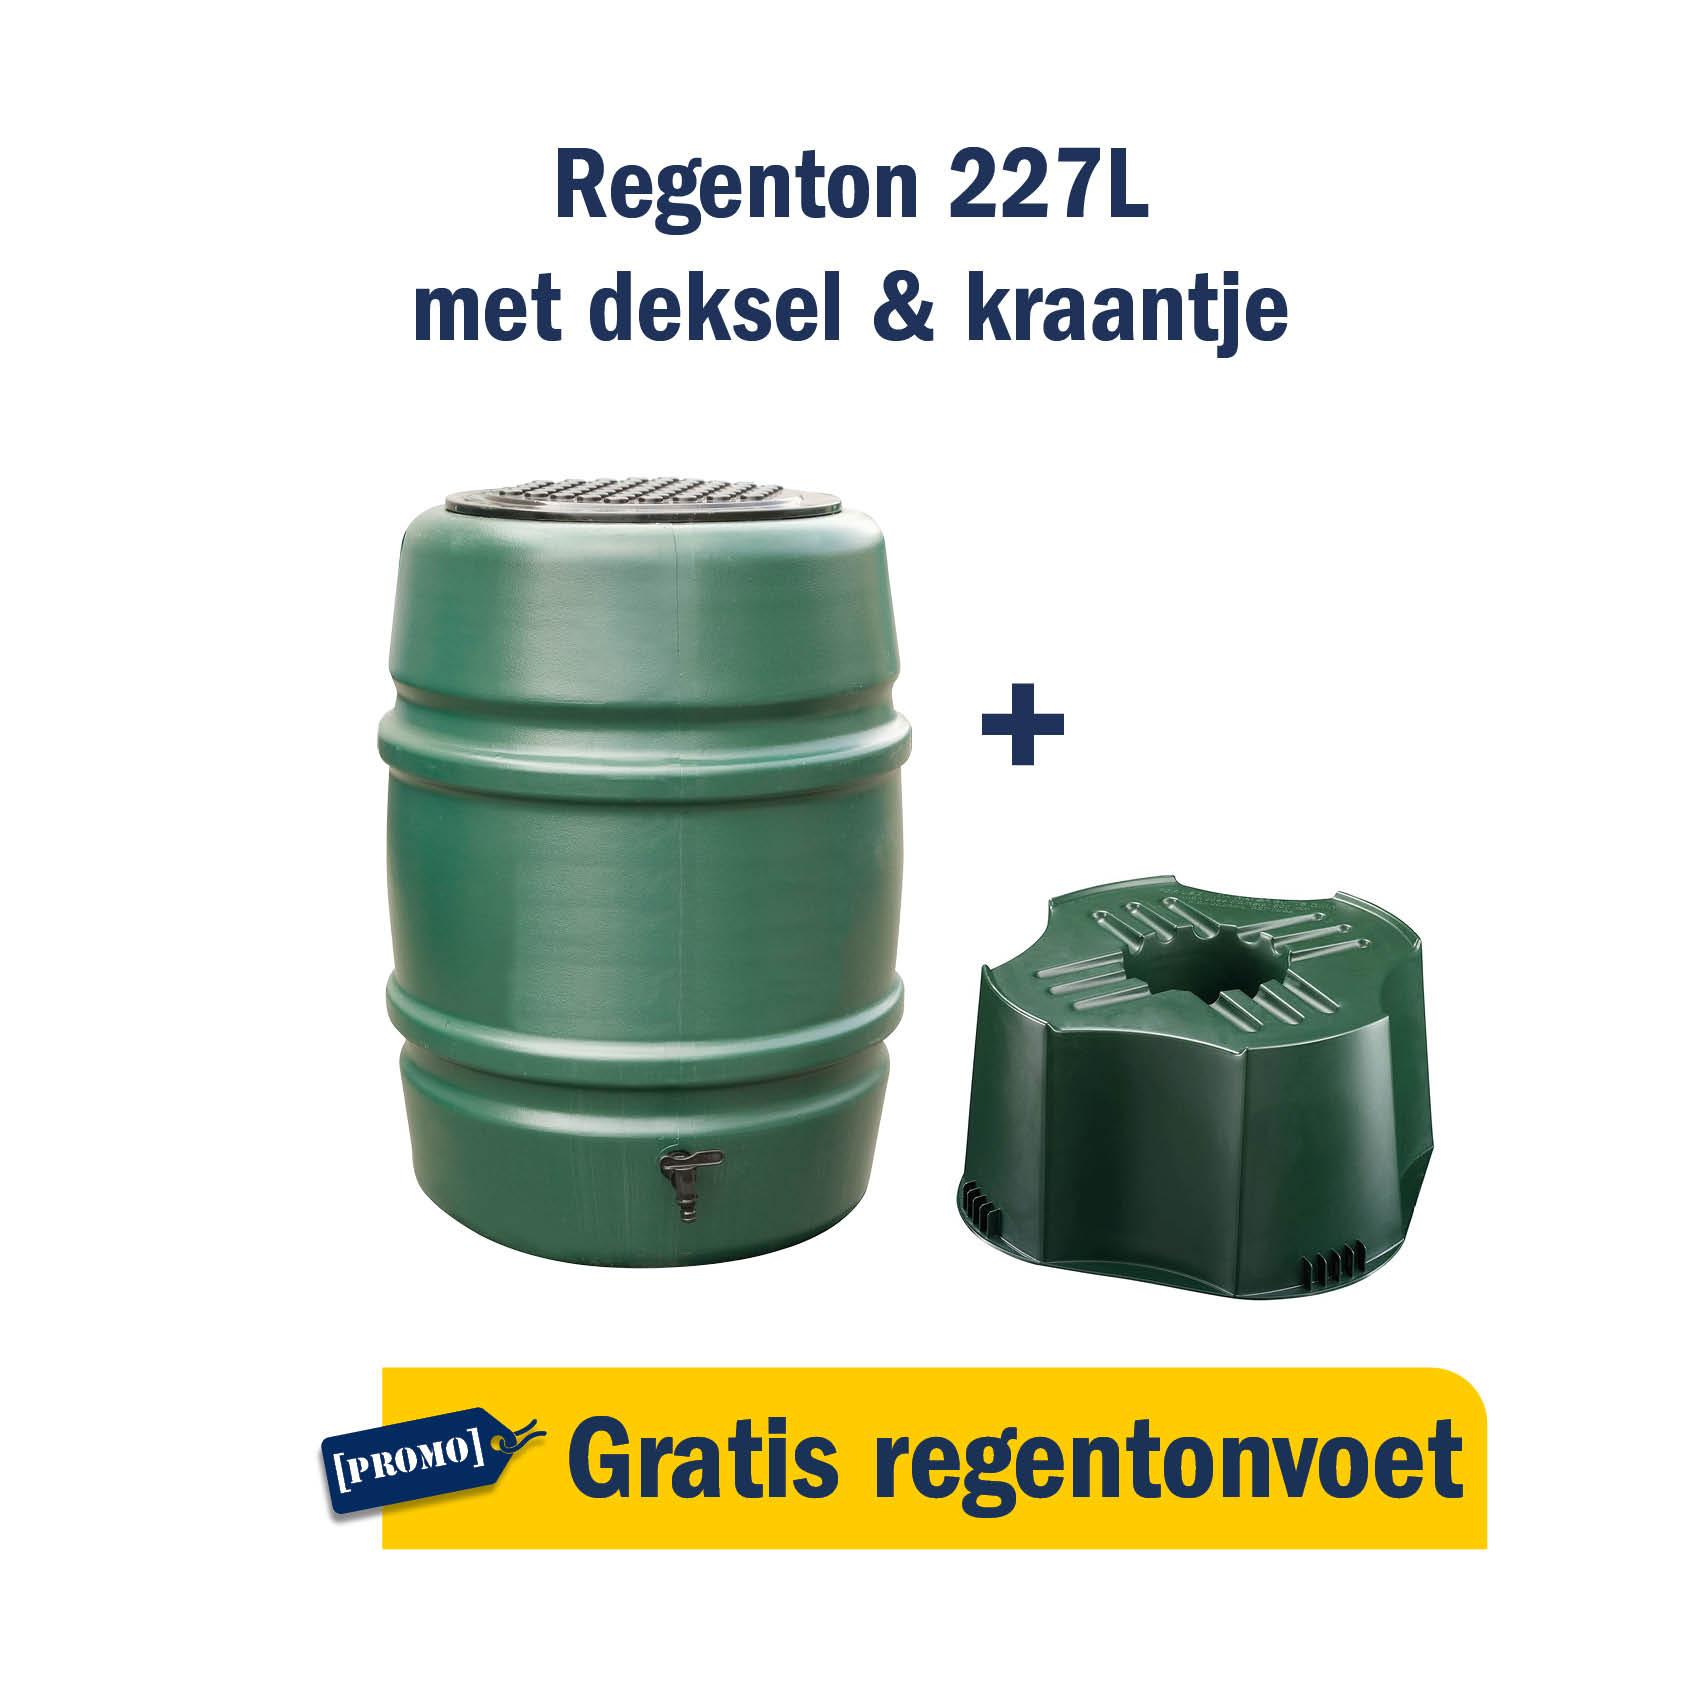 Regenton 227L + gratis regentonvoet